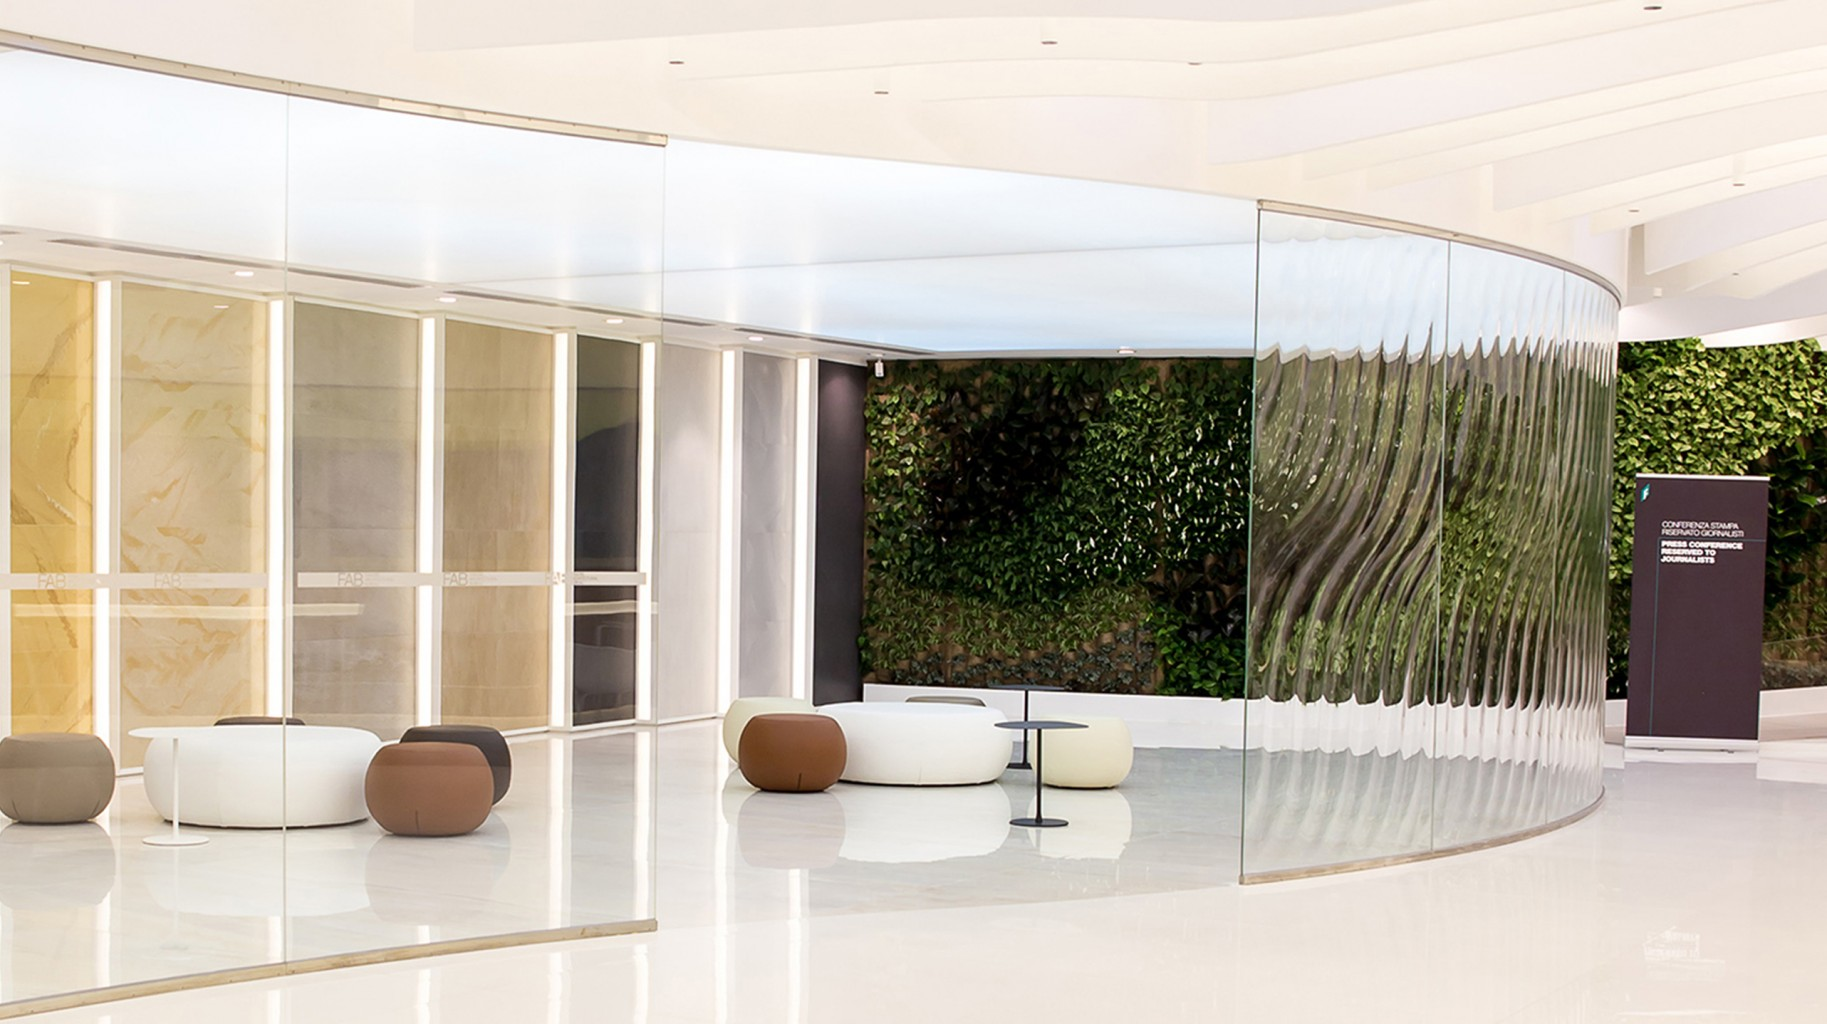 Fab fiandre architectural bureau cricursa gebogenes glas größe xxl